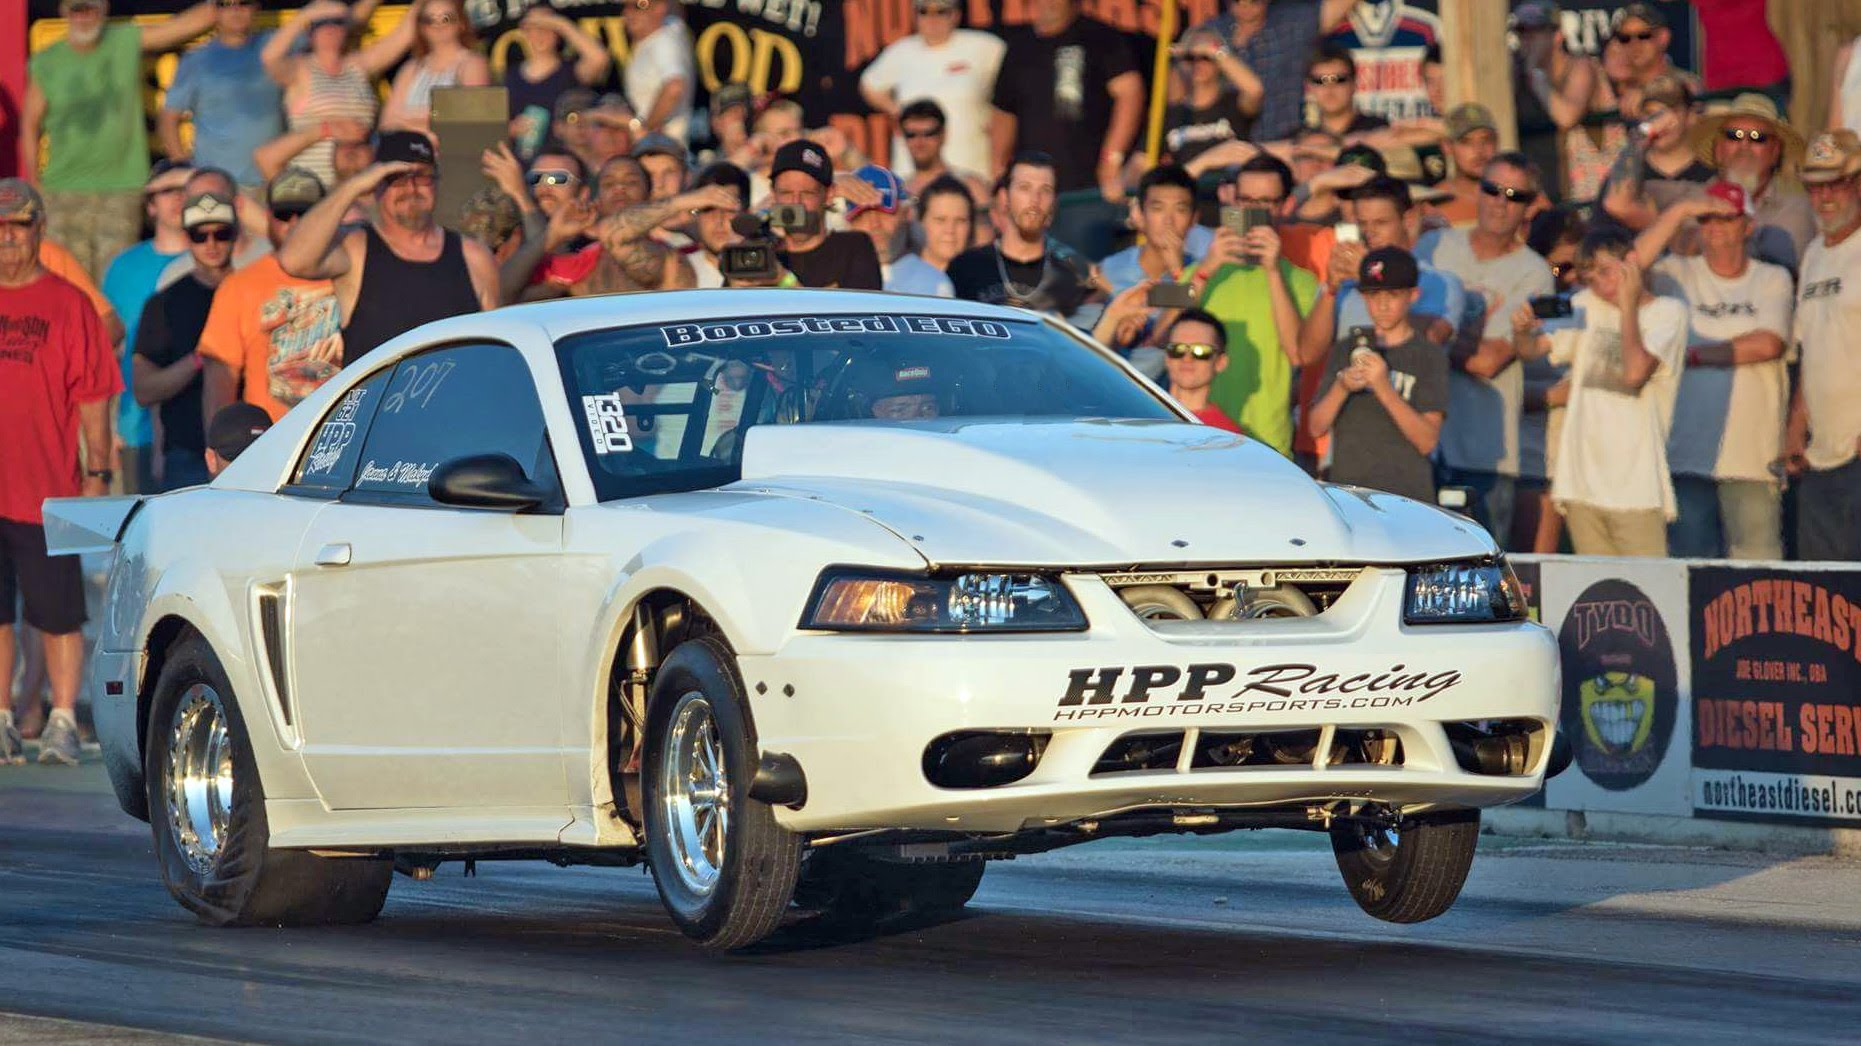 3000HP Ego Mustang